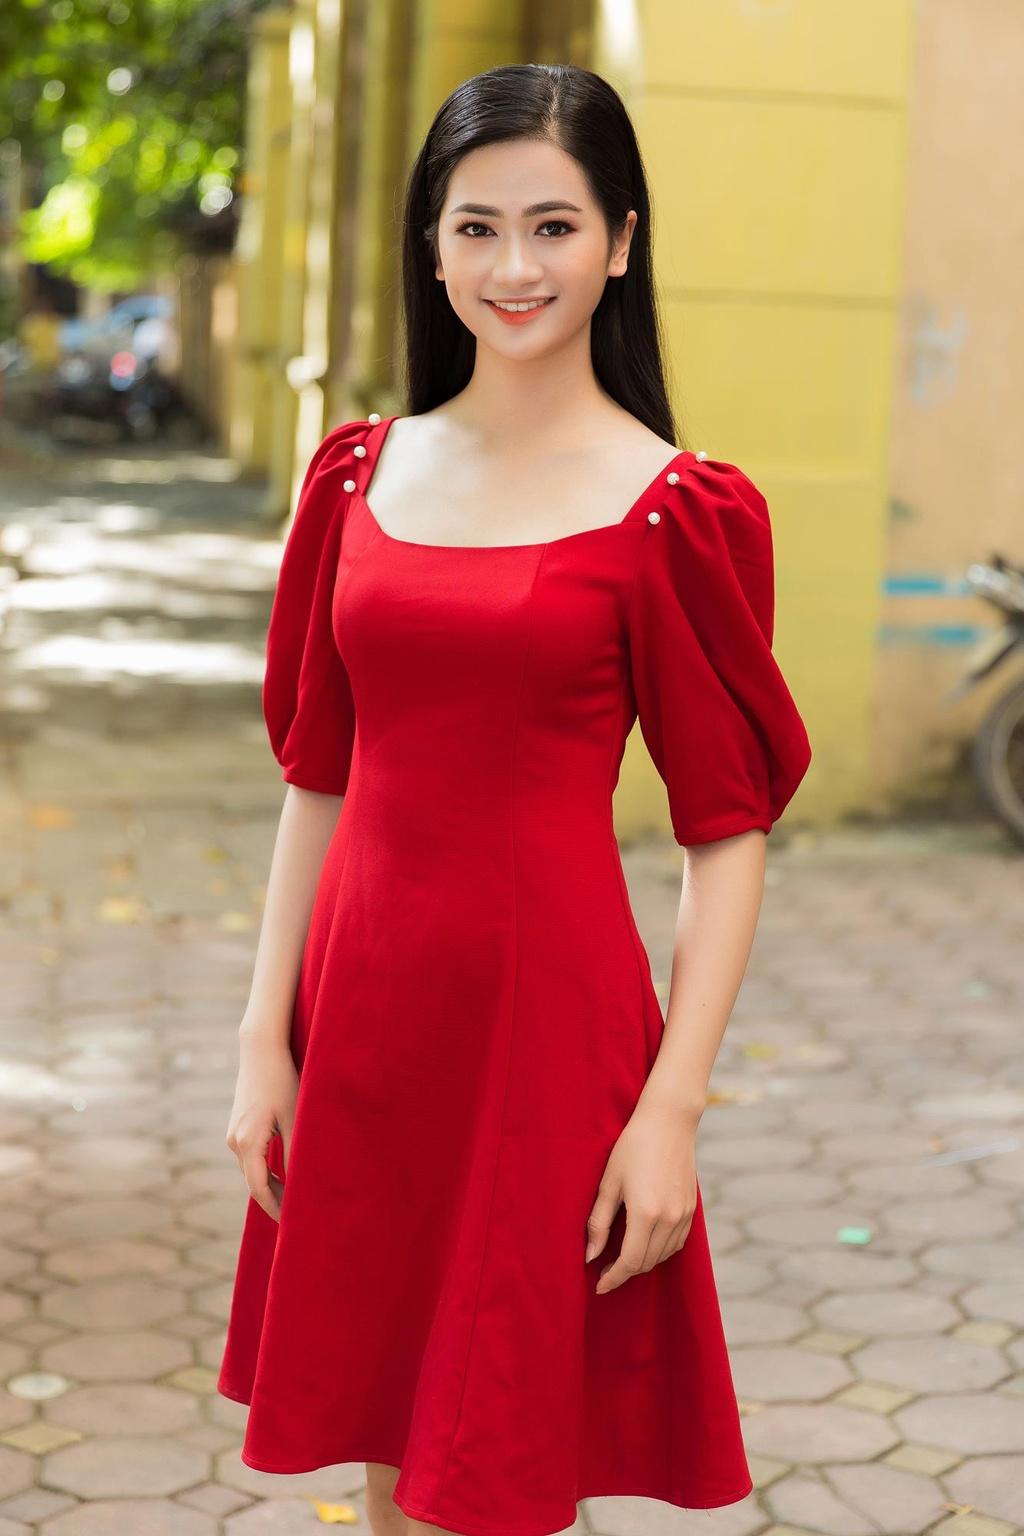 Dan thi sinh 10X du thi Hoa hau The gioi Viet Nam 2019 hinh anh 7